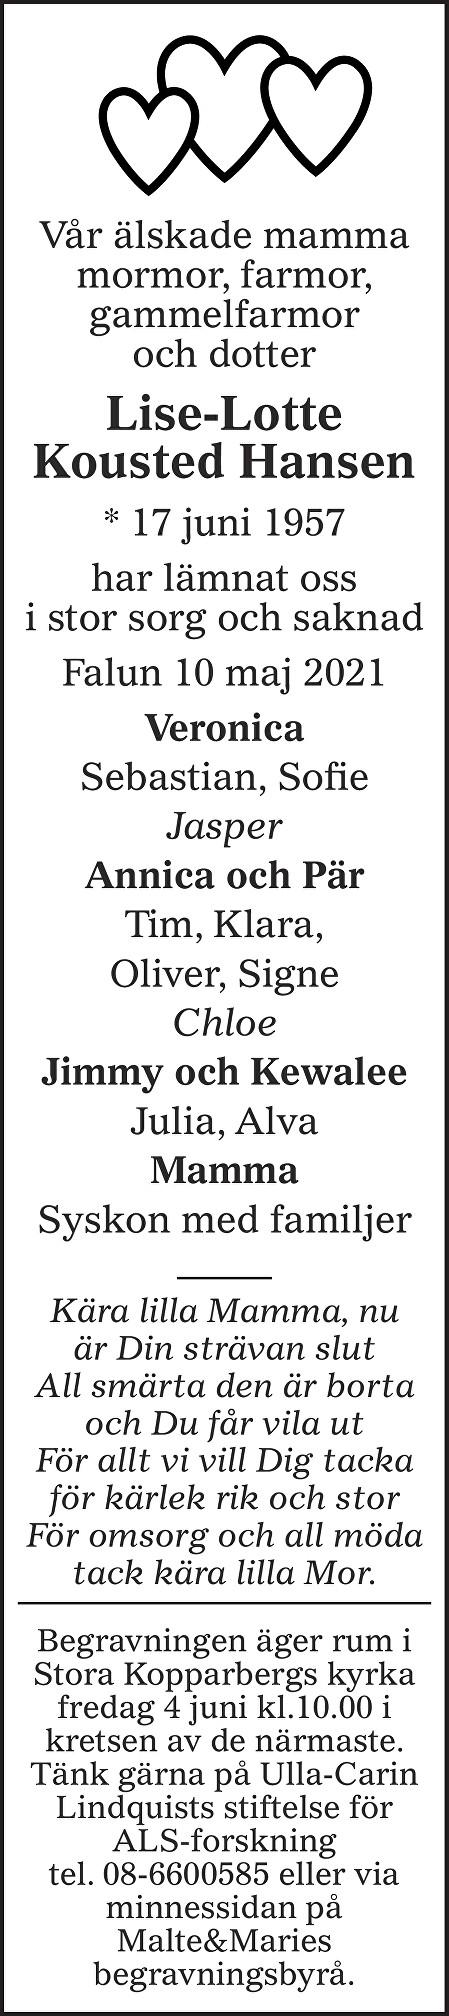 Lise-Lotte Kousted Hansen Death notice